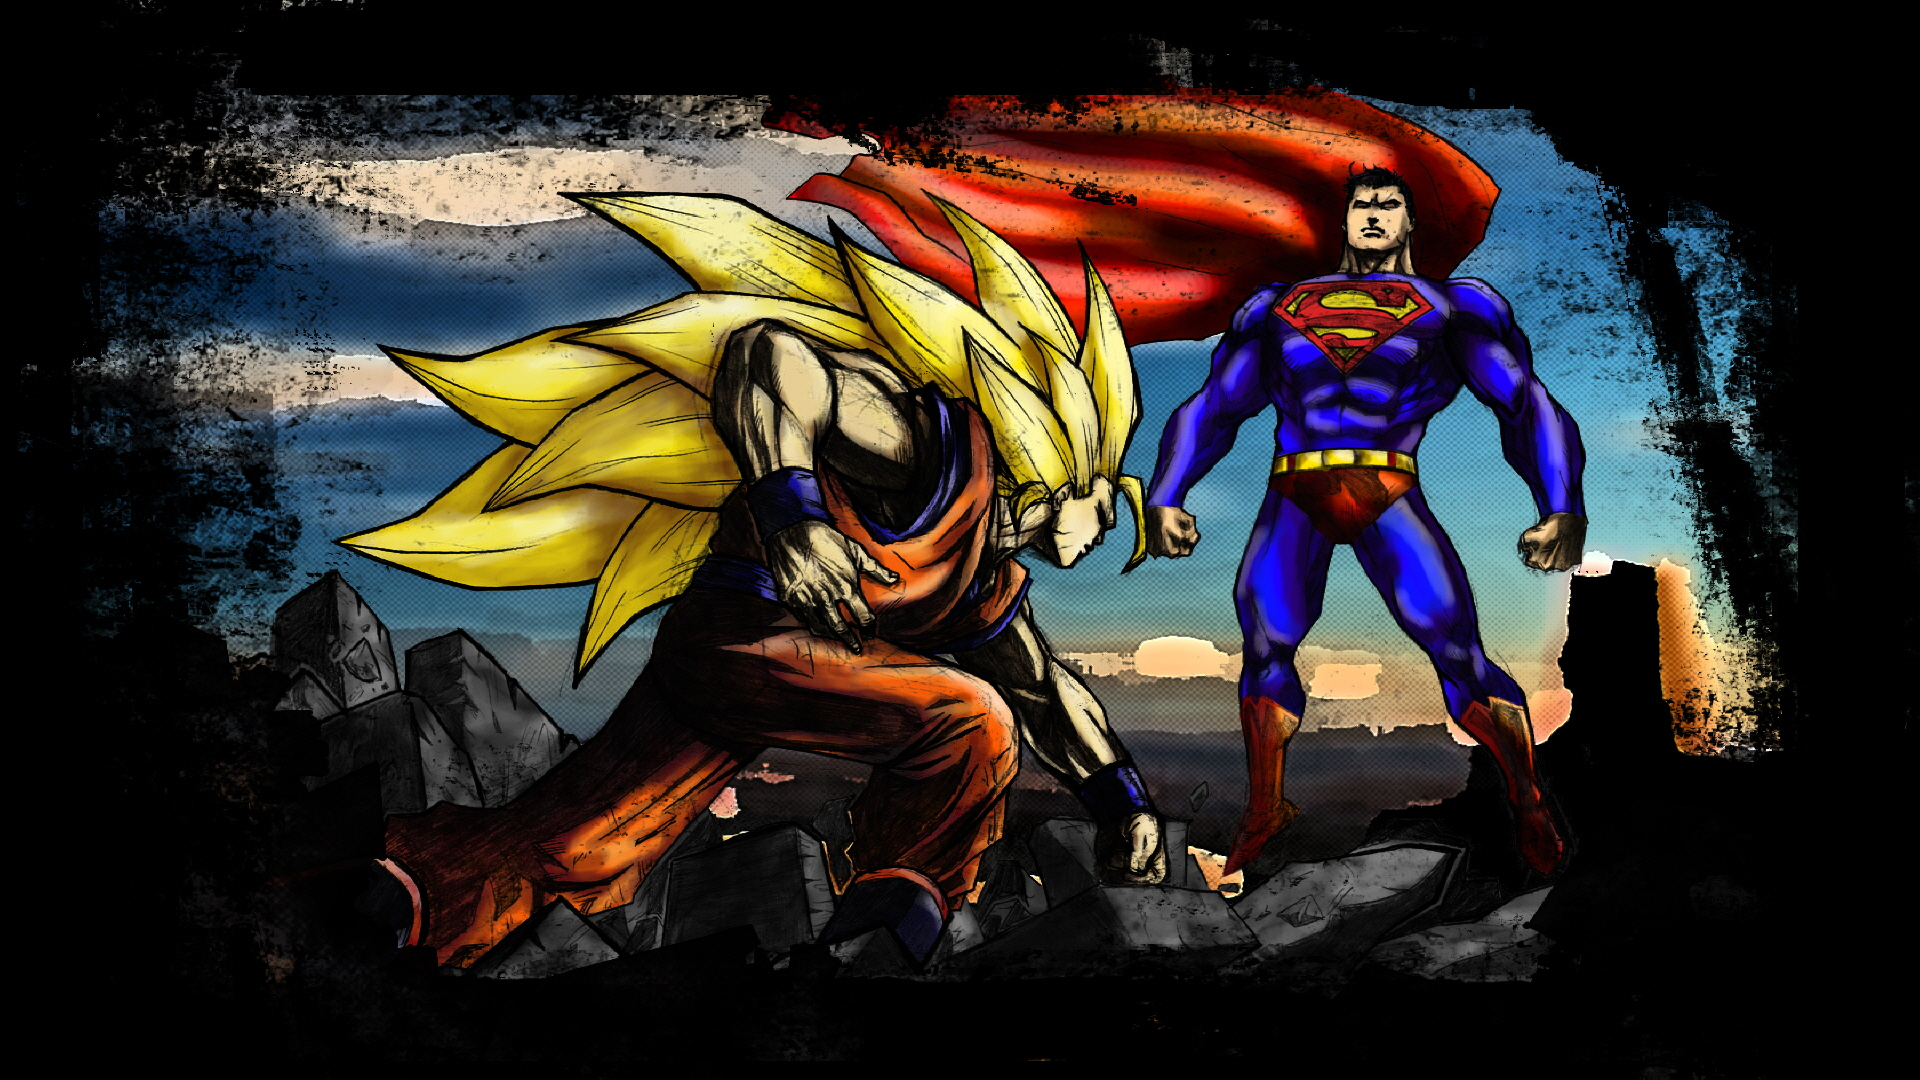 Dragon Ball Z Shenron Wallpaper   Anime Full HD Wallpaper 1920x1080